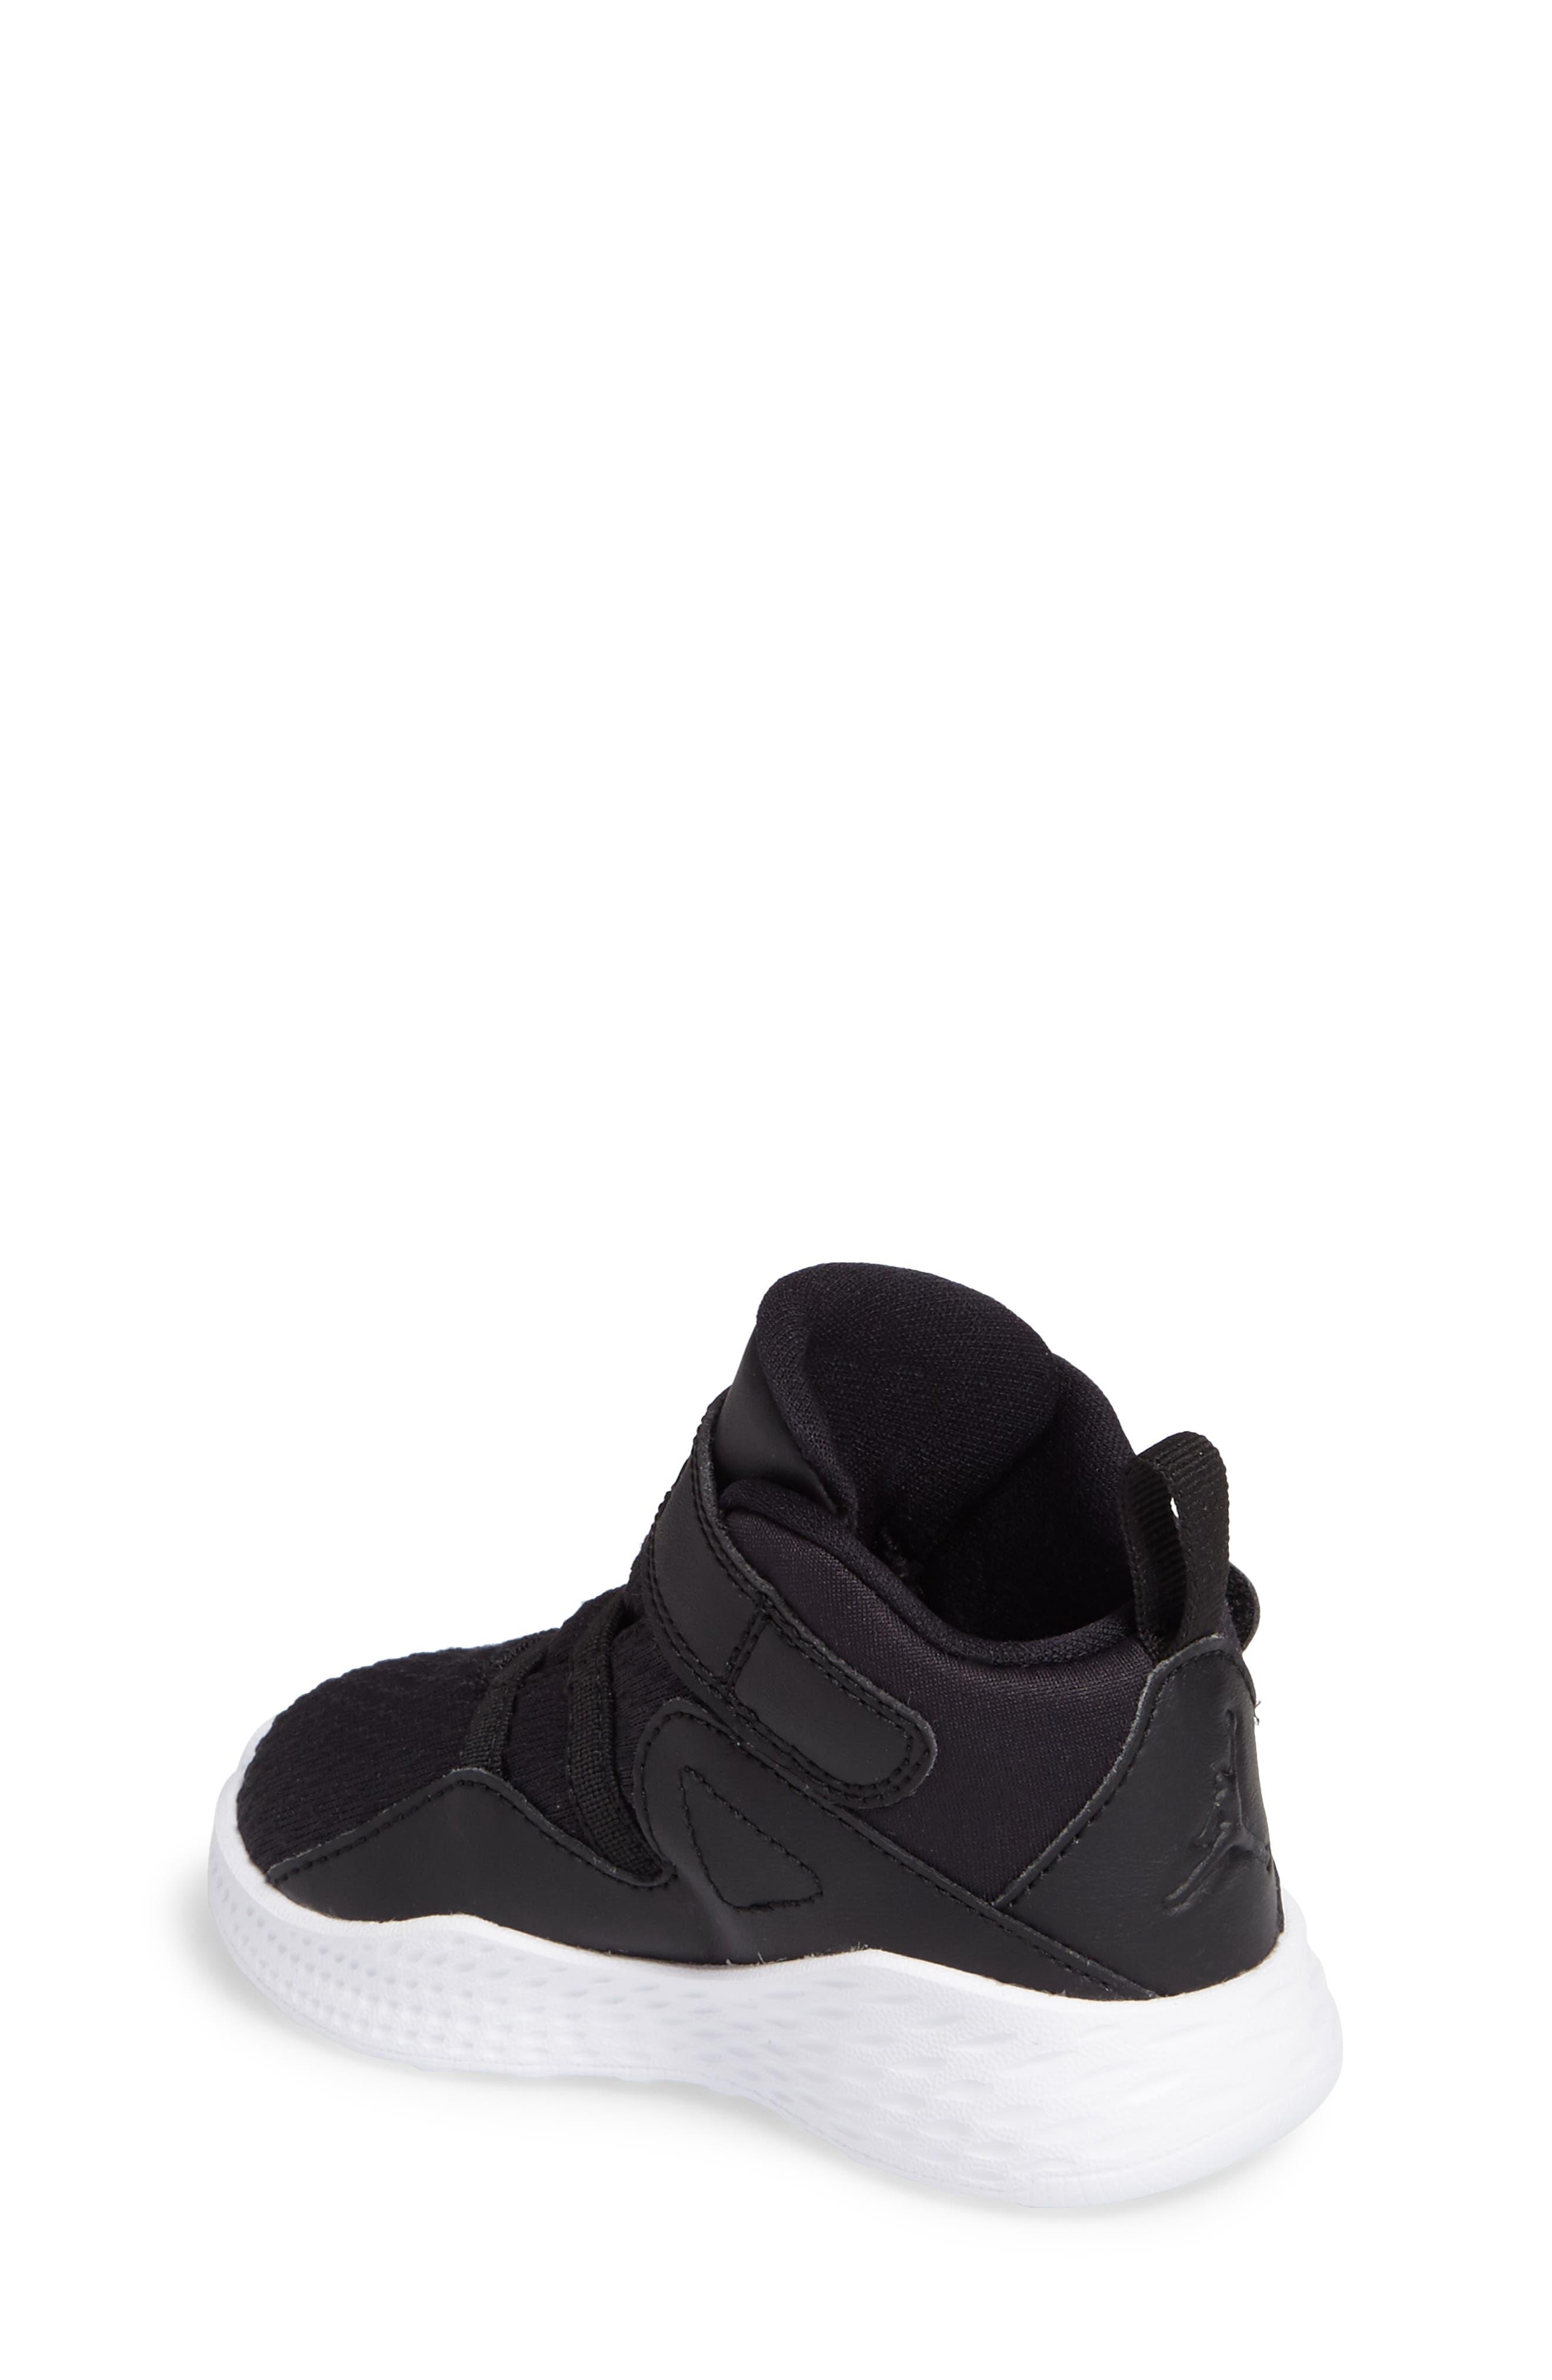 Jordan Formula 23 Basketball Shoe,                             Alternate thumbnail 3, color,